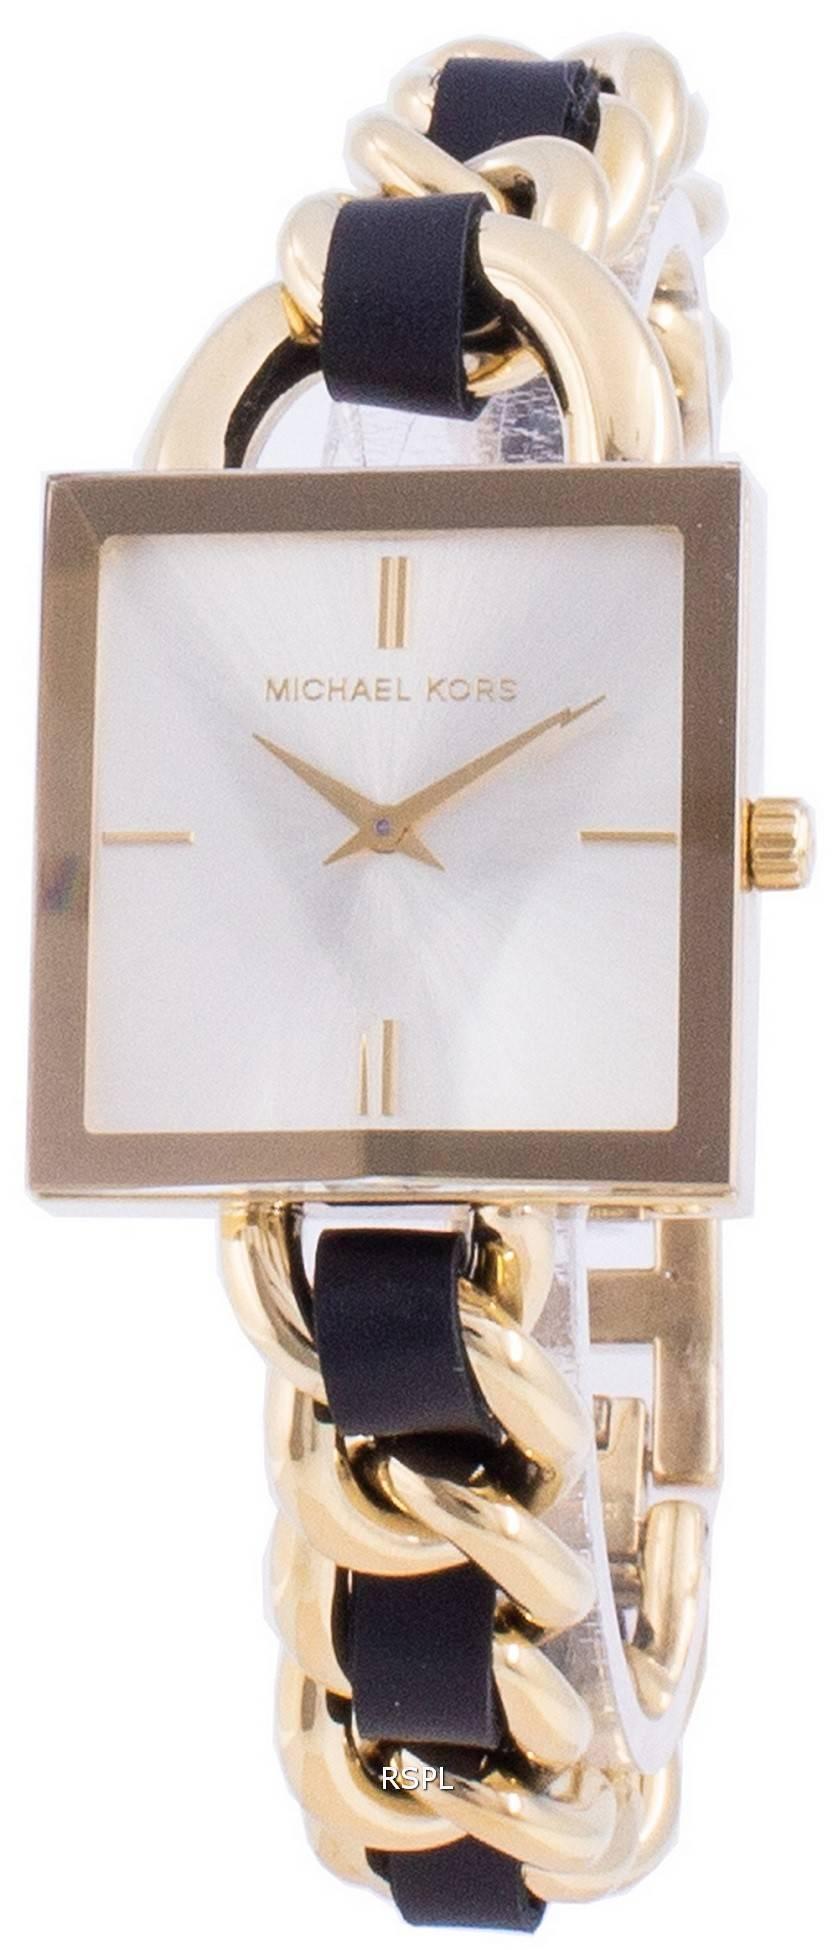 Michael Kors Chain Lock MK4445 Quartz Women's Watch